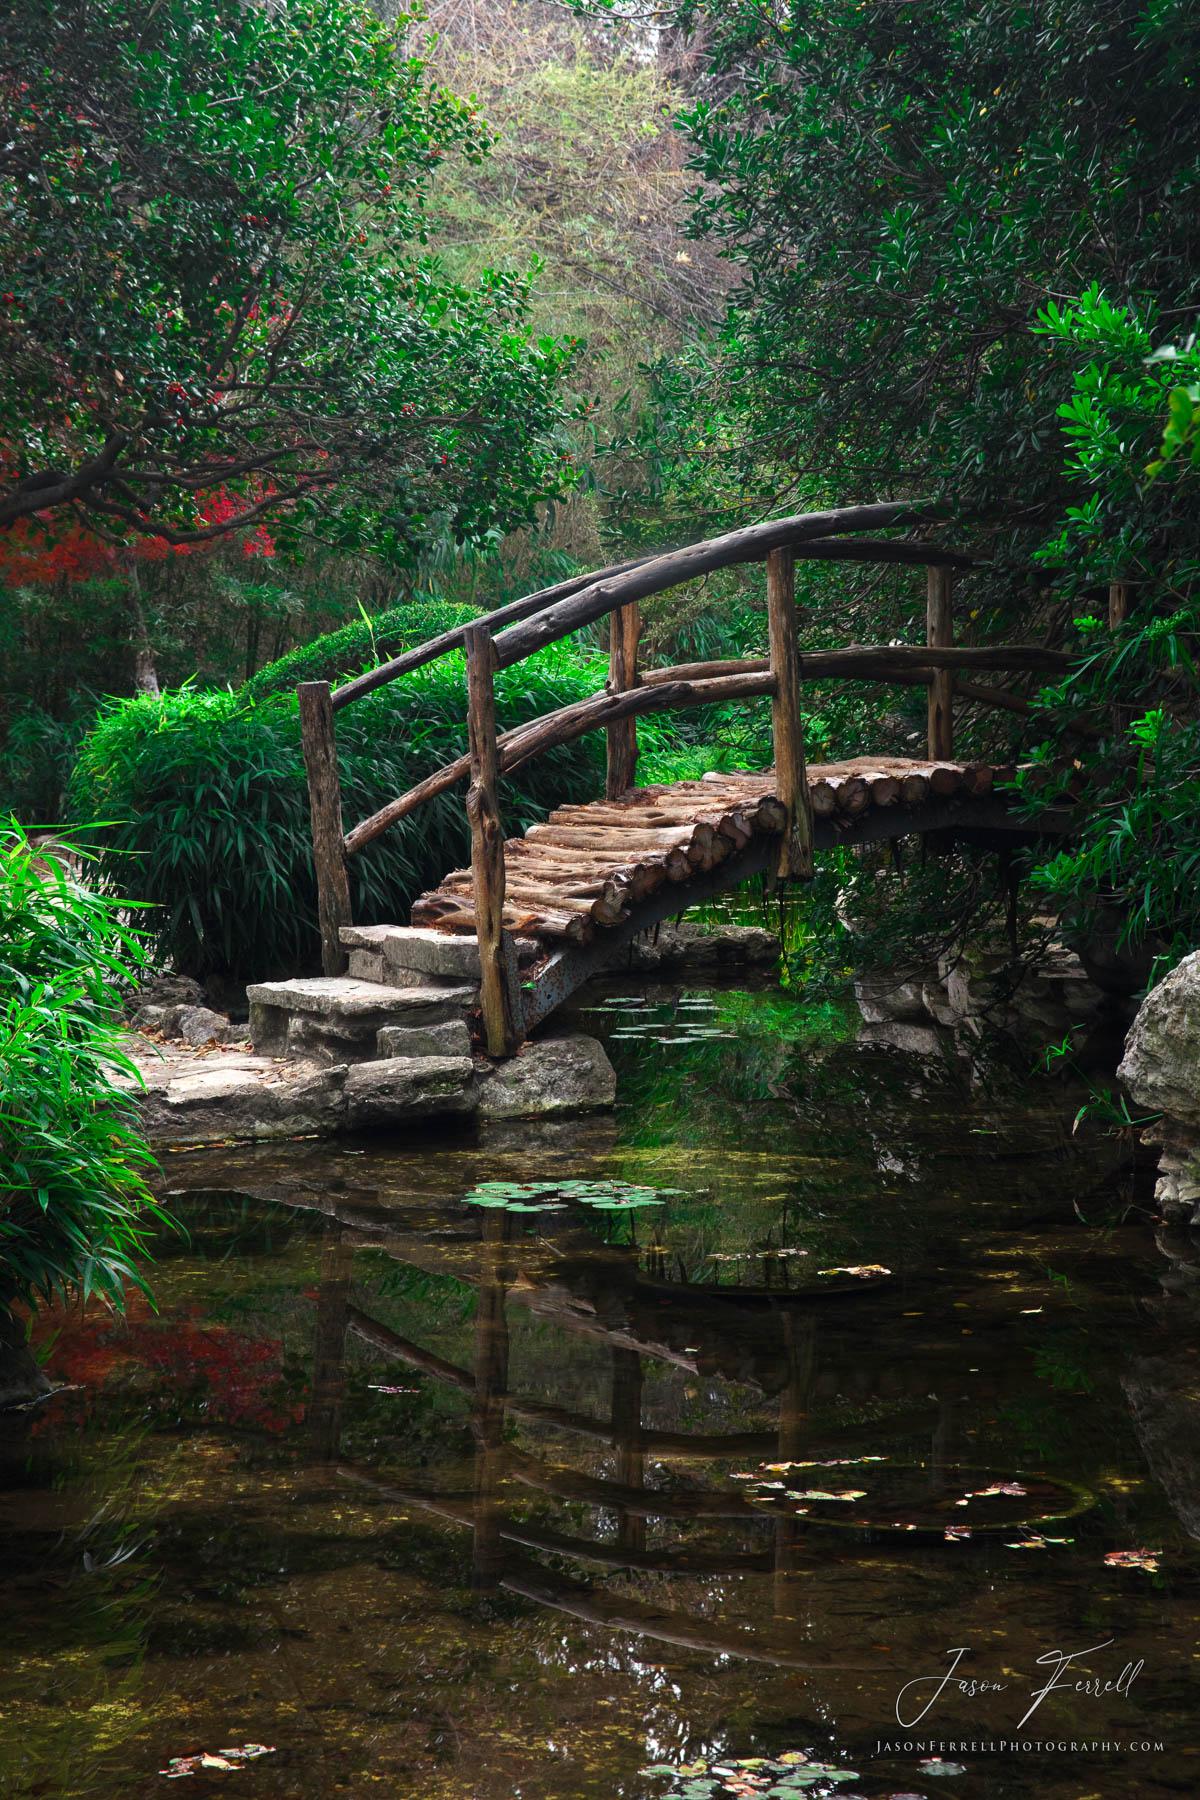 reflect, austin, texas, bridge, stream, river, water, zilker botanical garden, photo